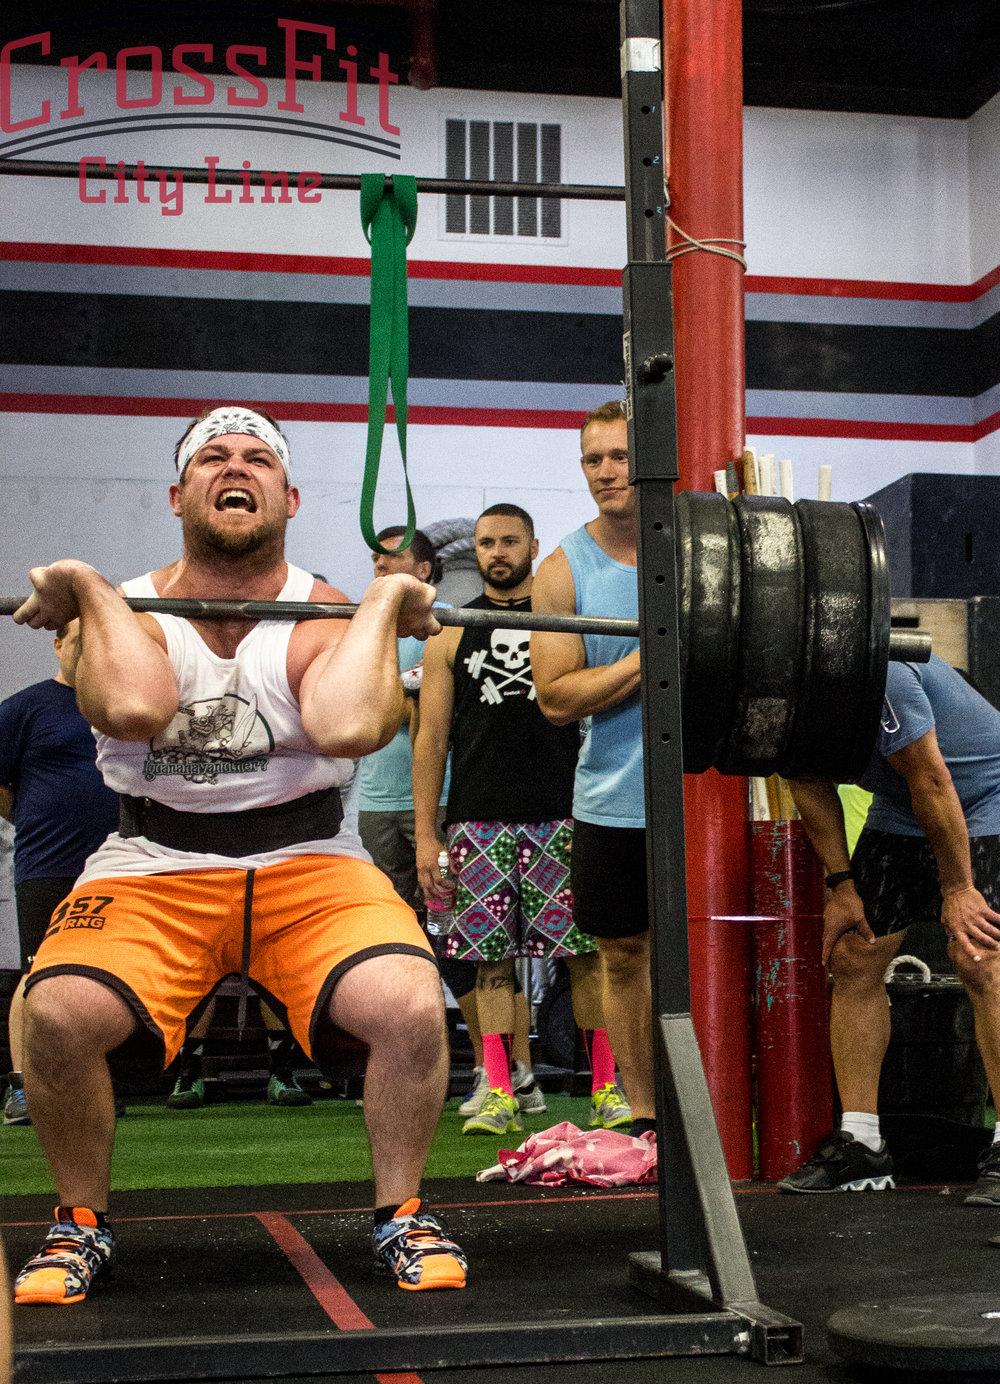 Bearcat putting up BIG weight at the Throwdown